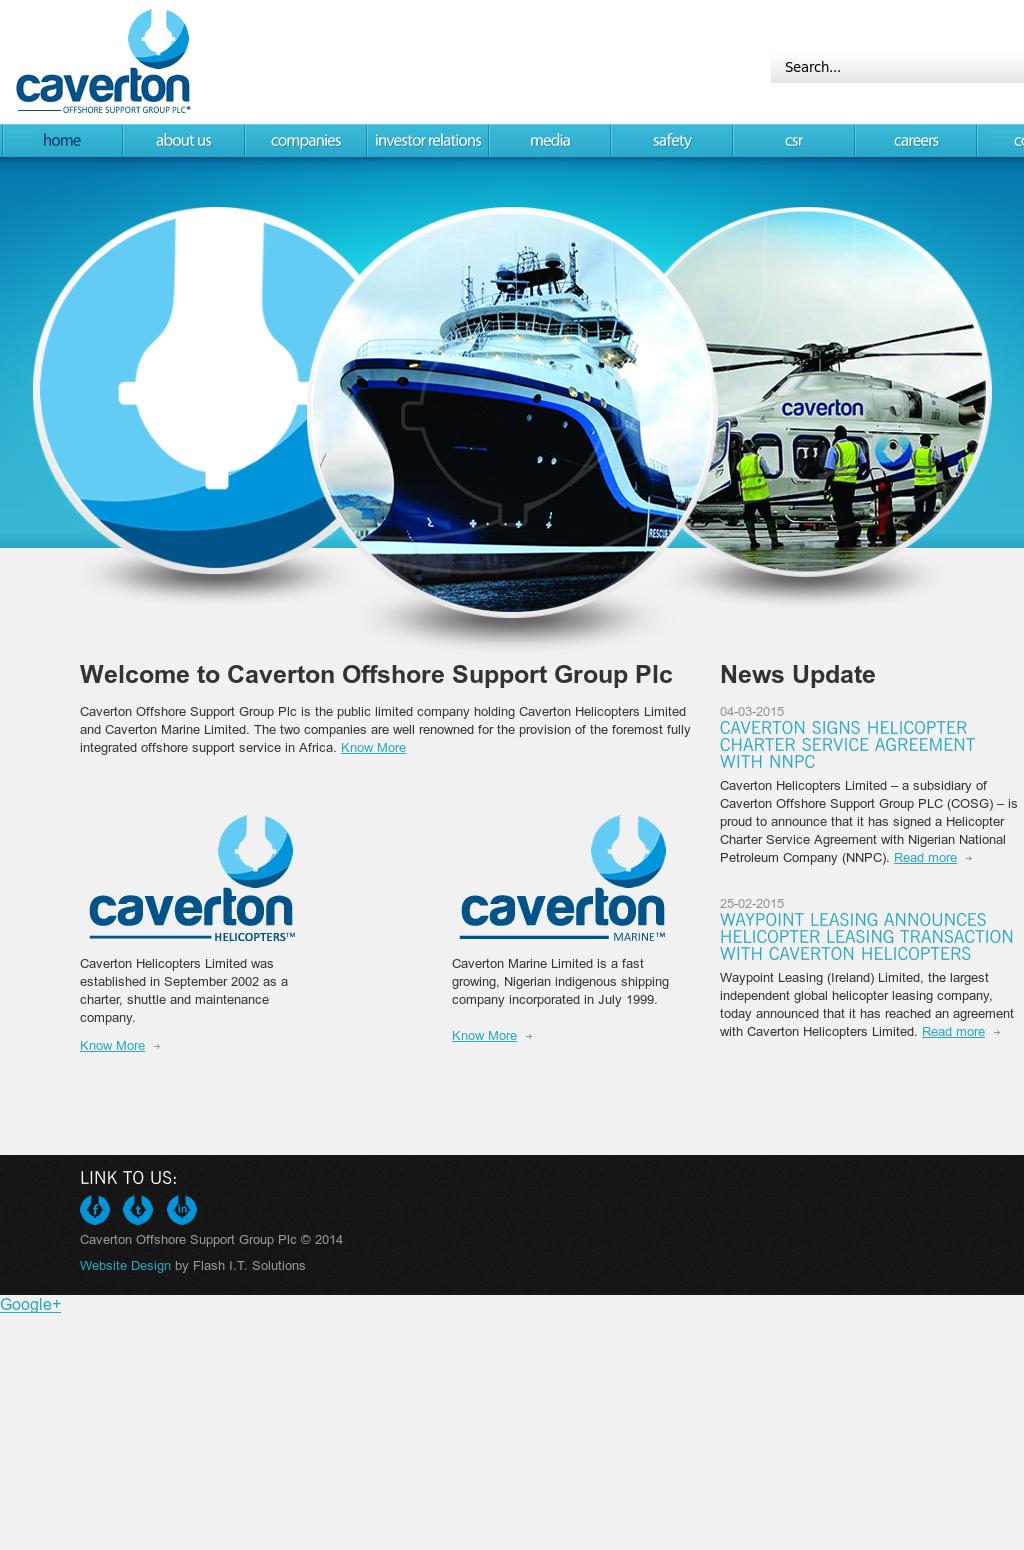 Caverton logo